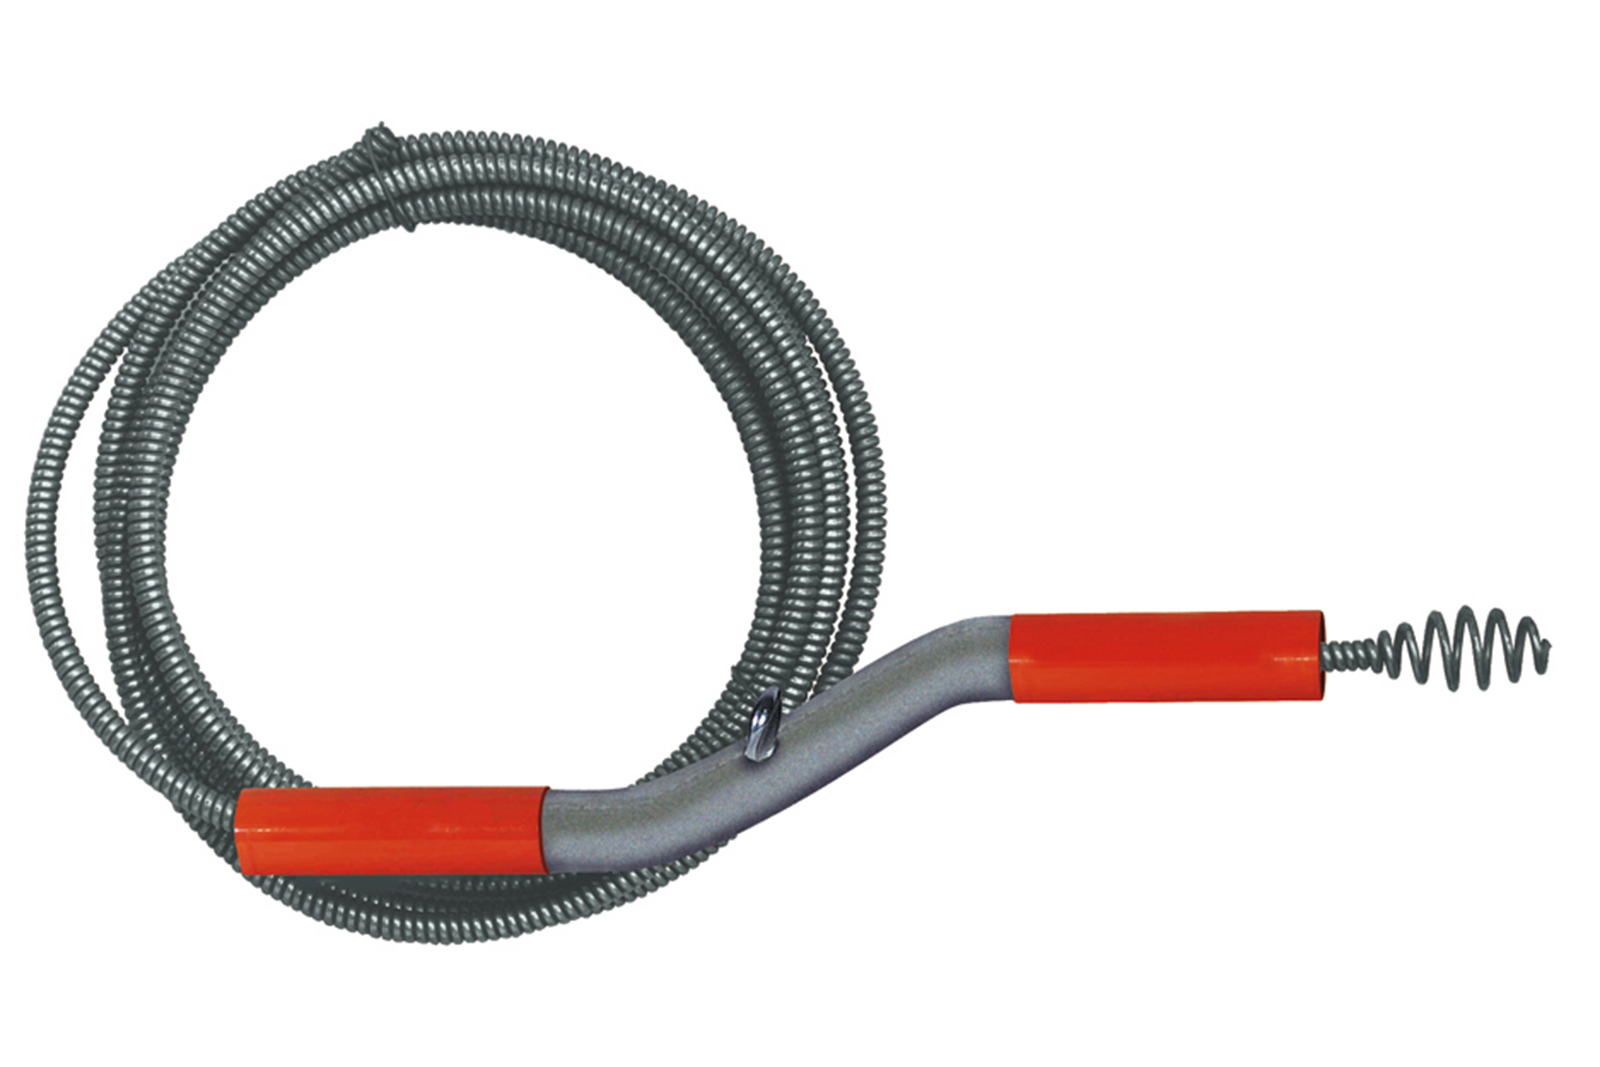 Трос для прочистки General pipe Flexicore 35fl1-a